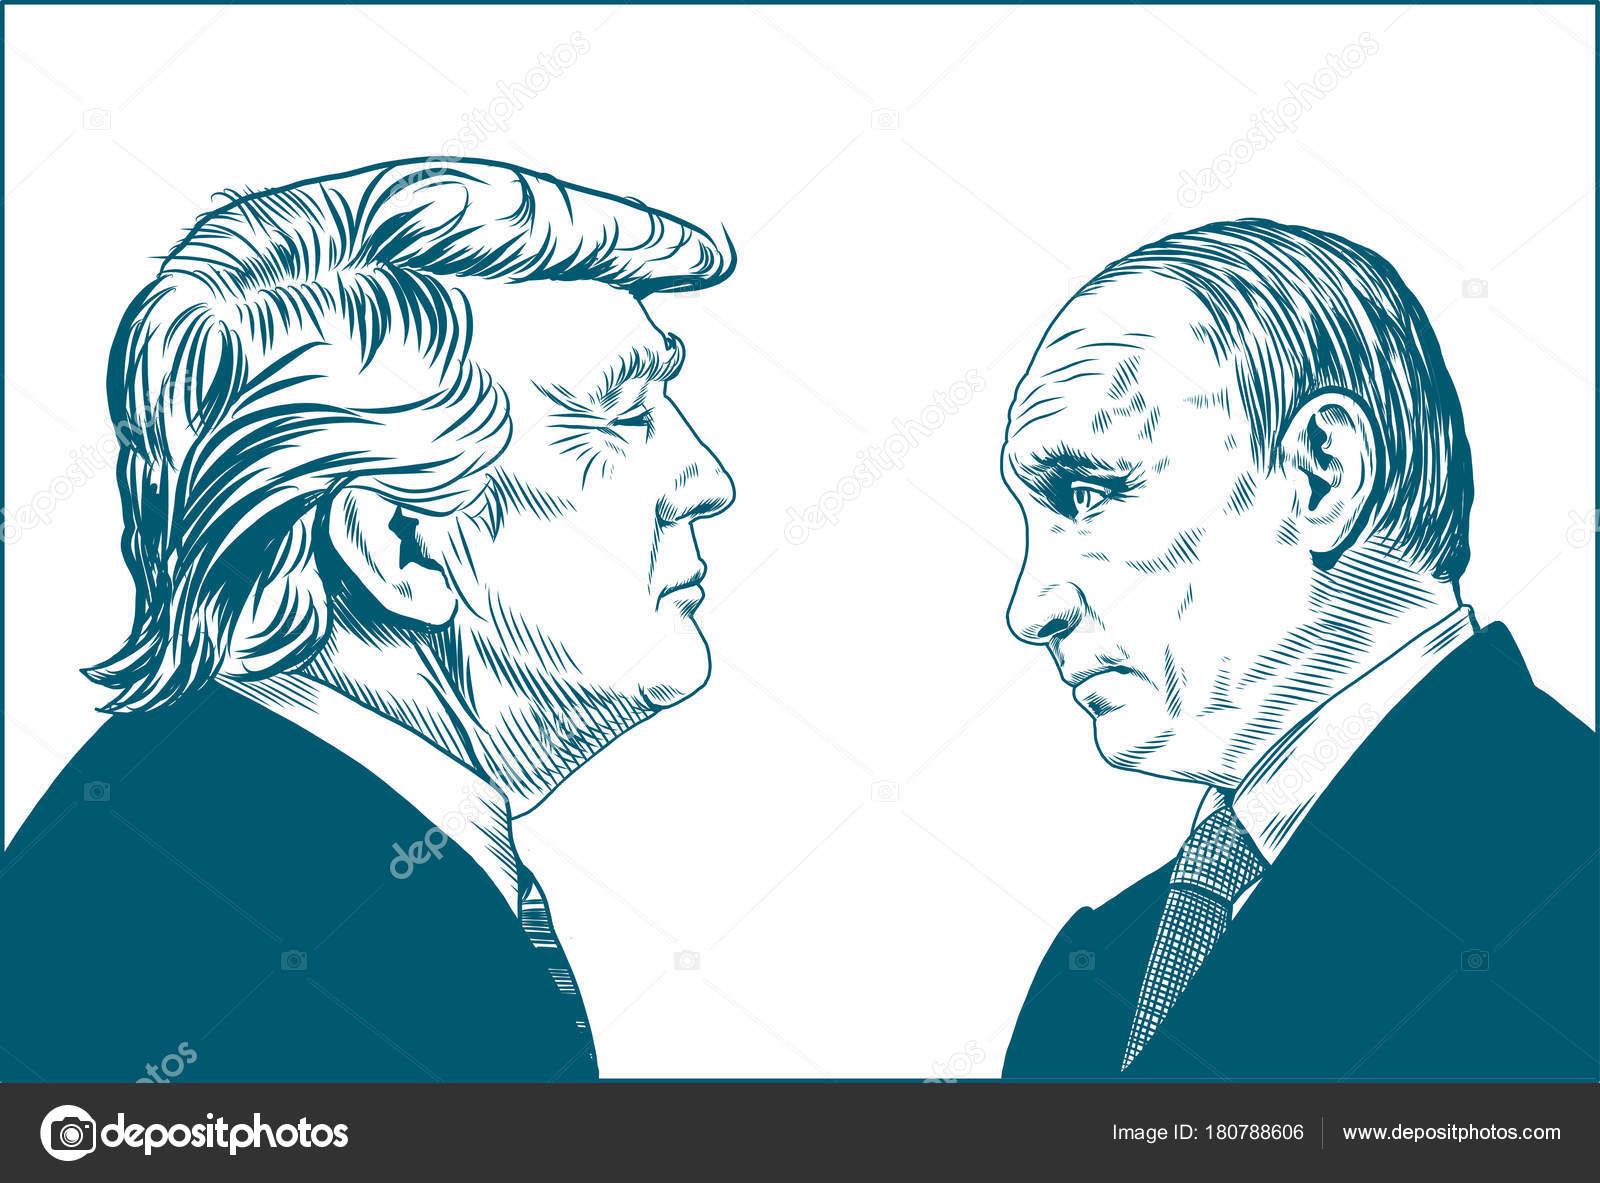 Donald Trump Vladimir Putin Vector Portrait Drawing Illustration